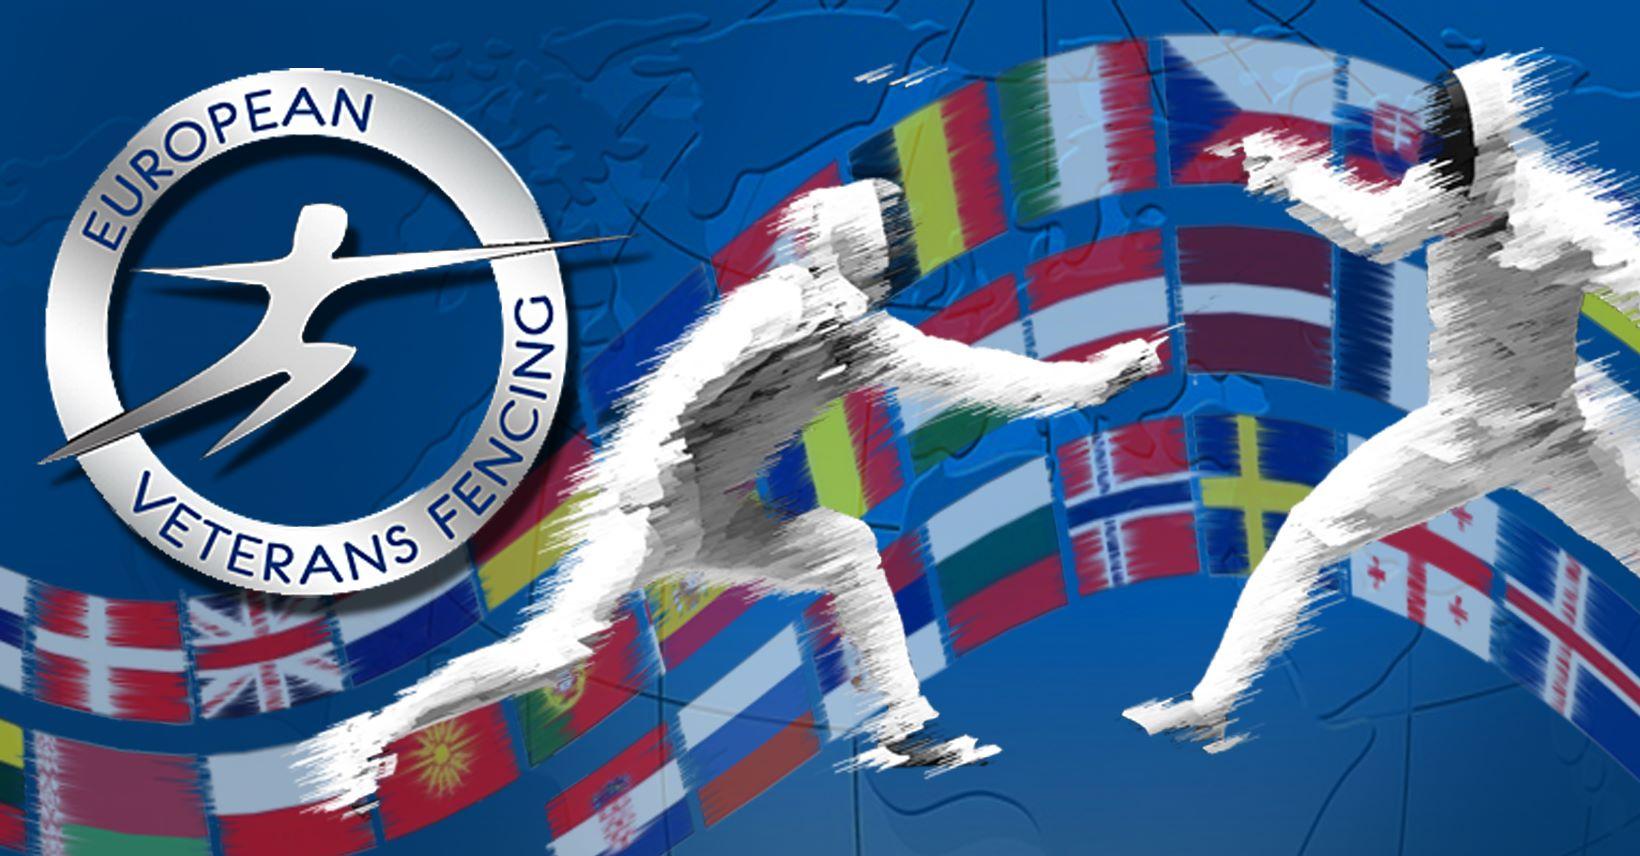 European_vet_fencing